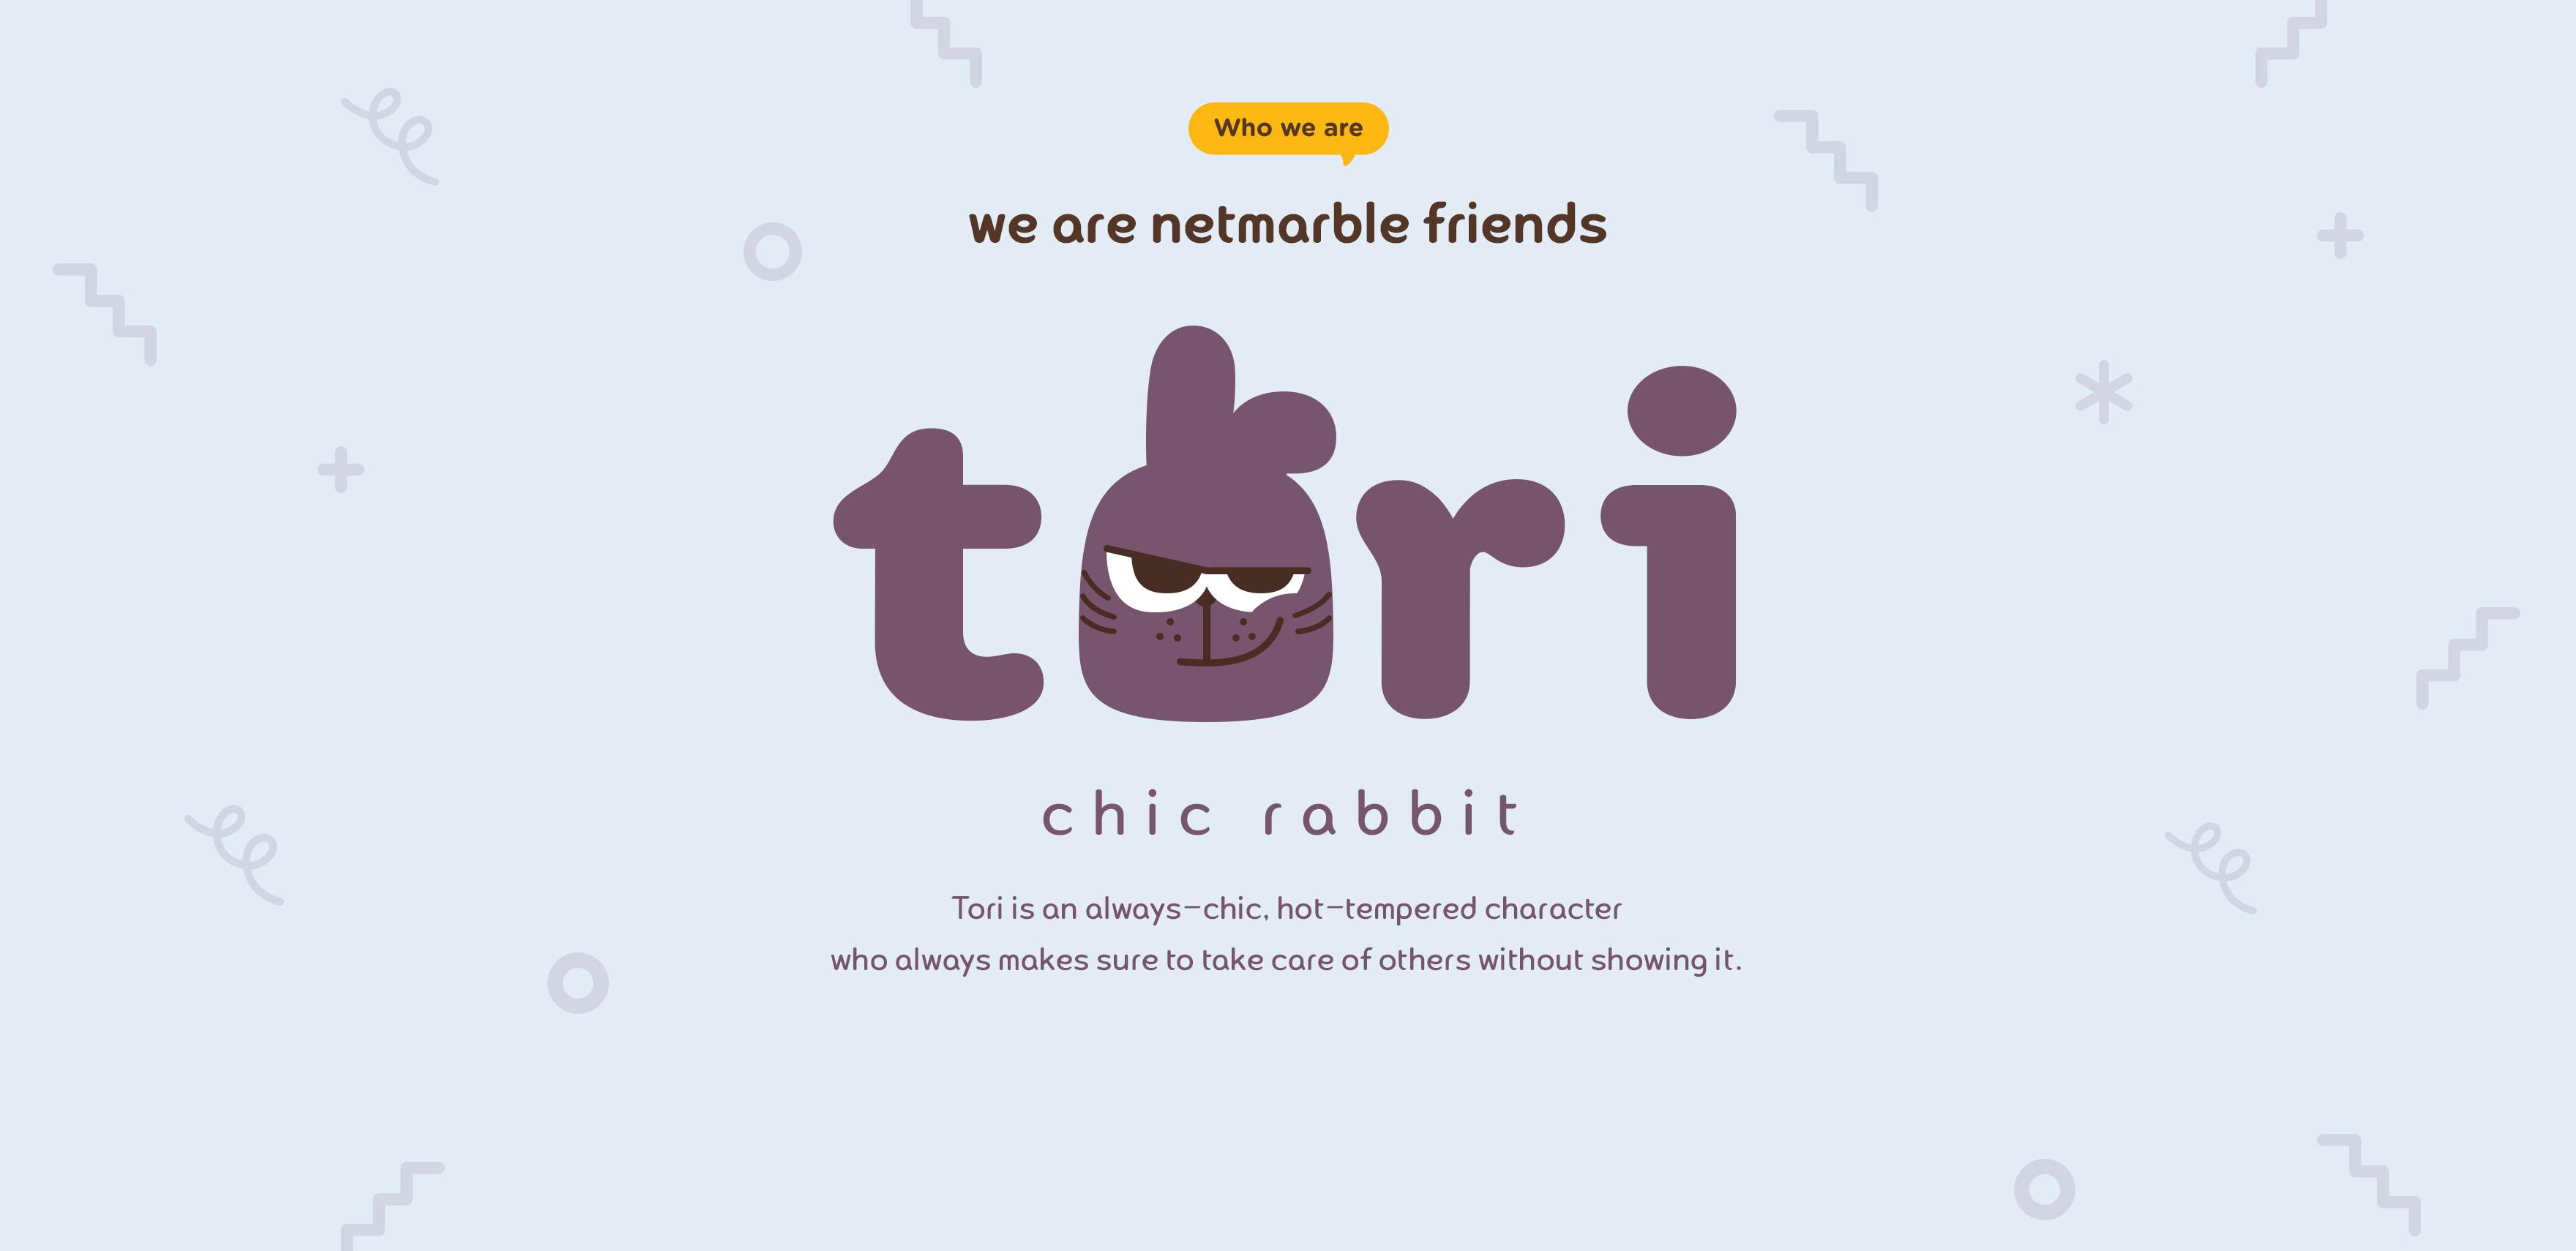 TORI. CHIC RABBIT.